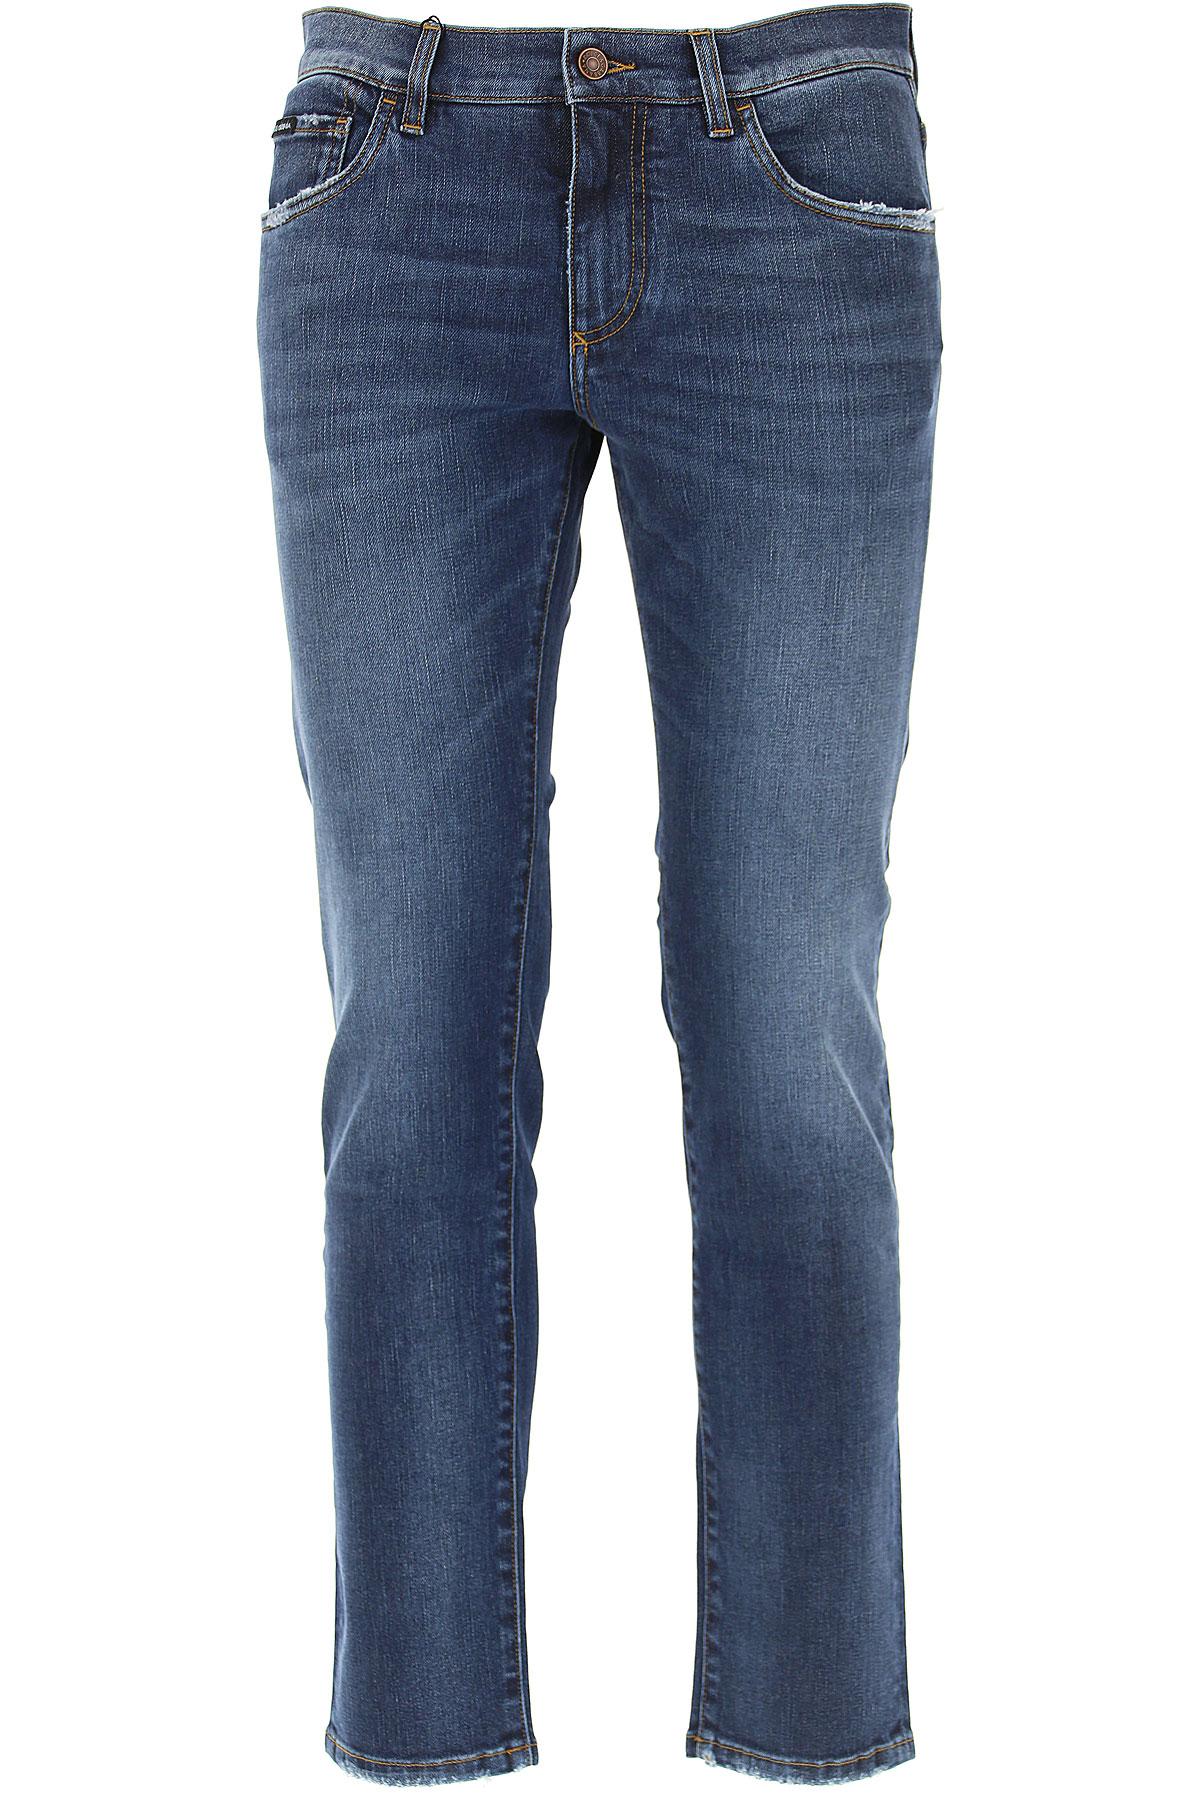 Dolce & Gabbana Jeans, Denim Blue, Cotton, 2017, 28 30 32 34 36 38